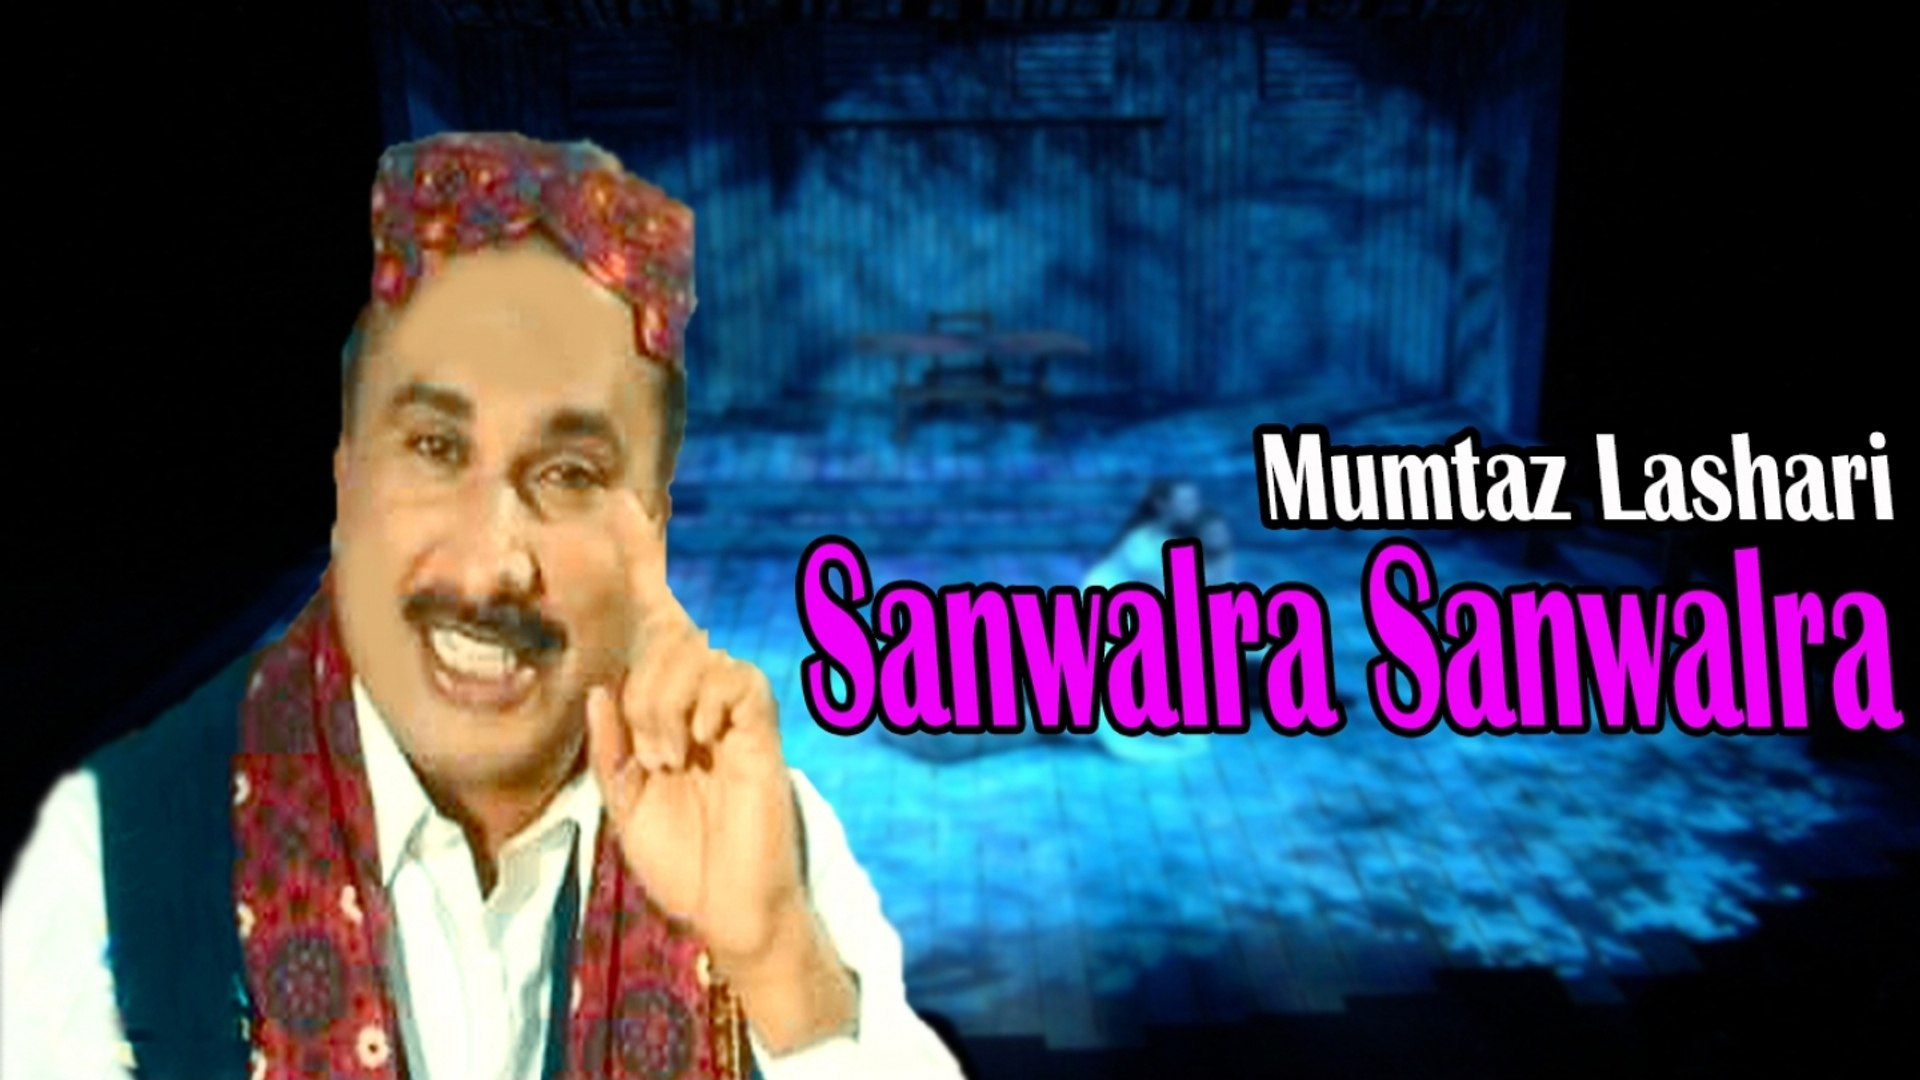 Mumtaz Lashari - Sanwalra Sanwalra